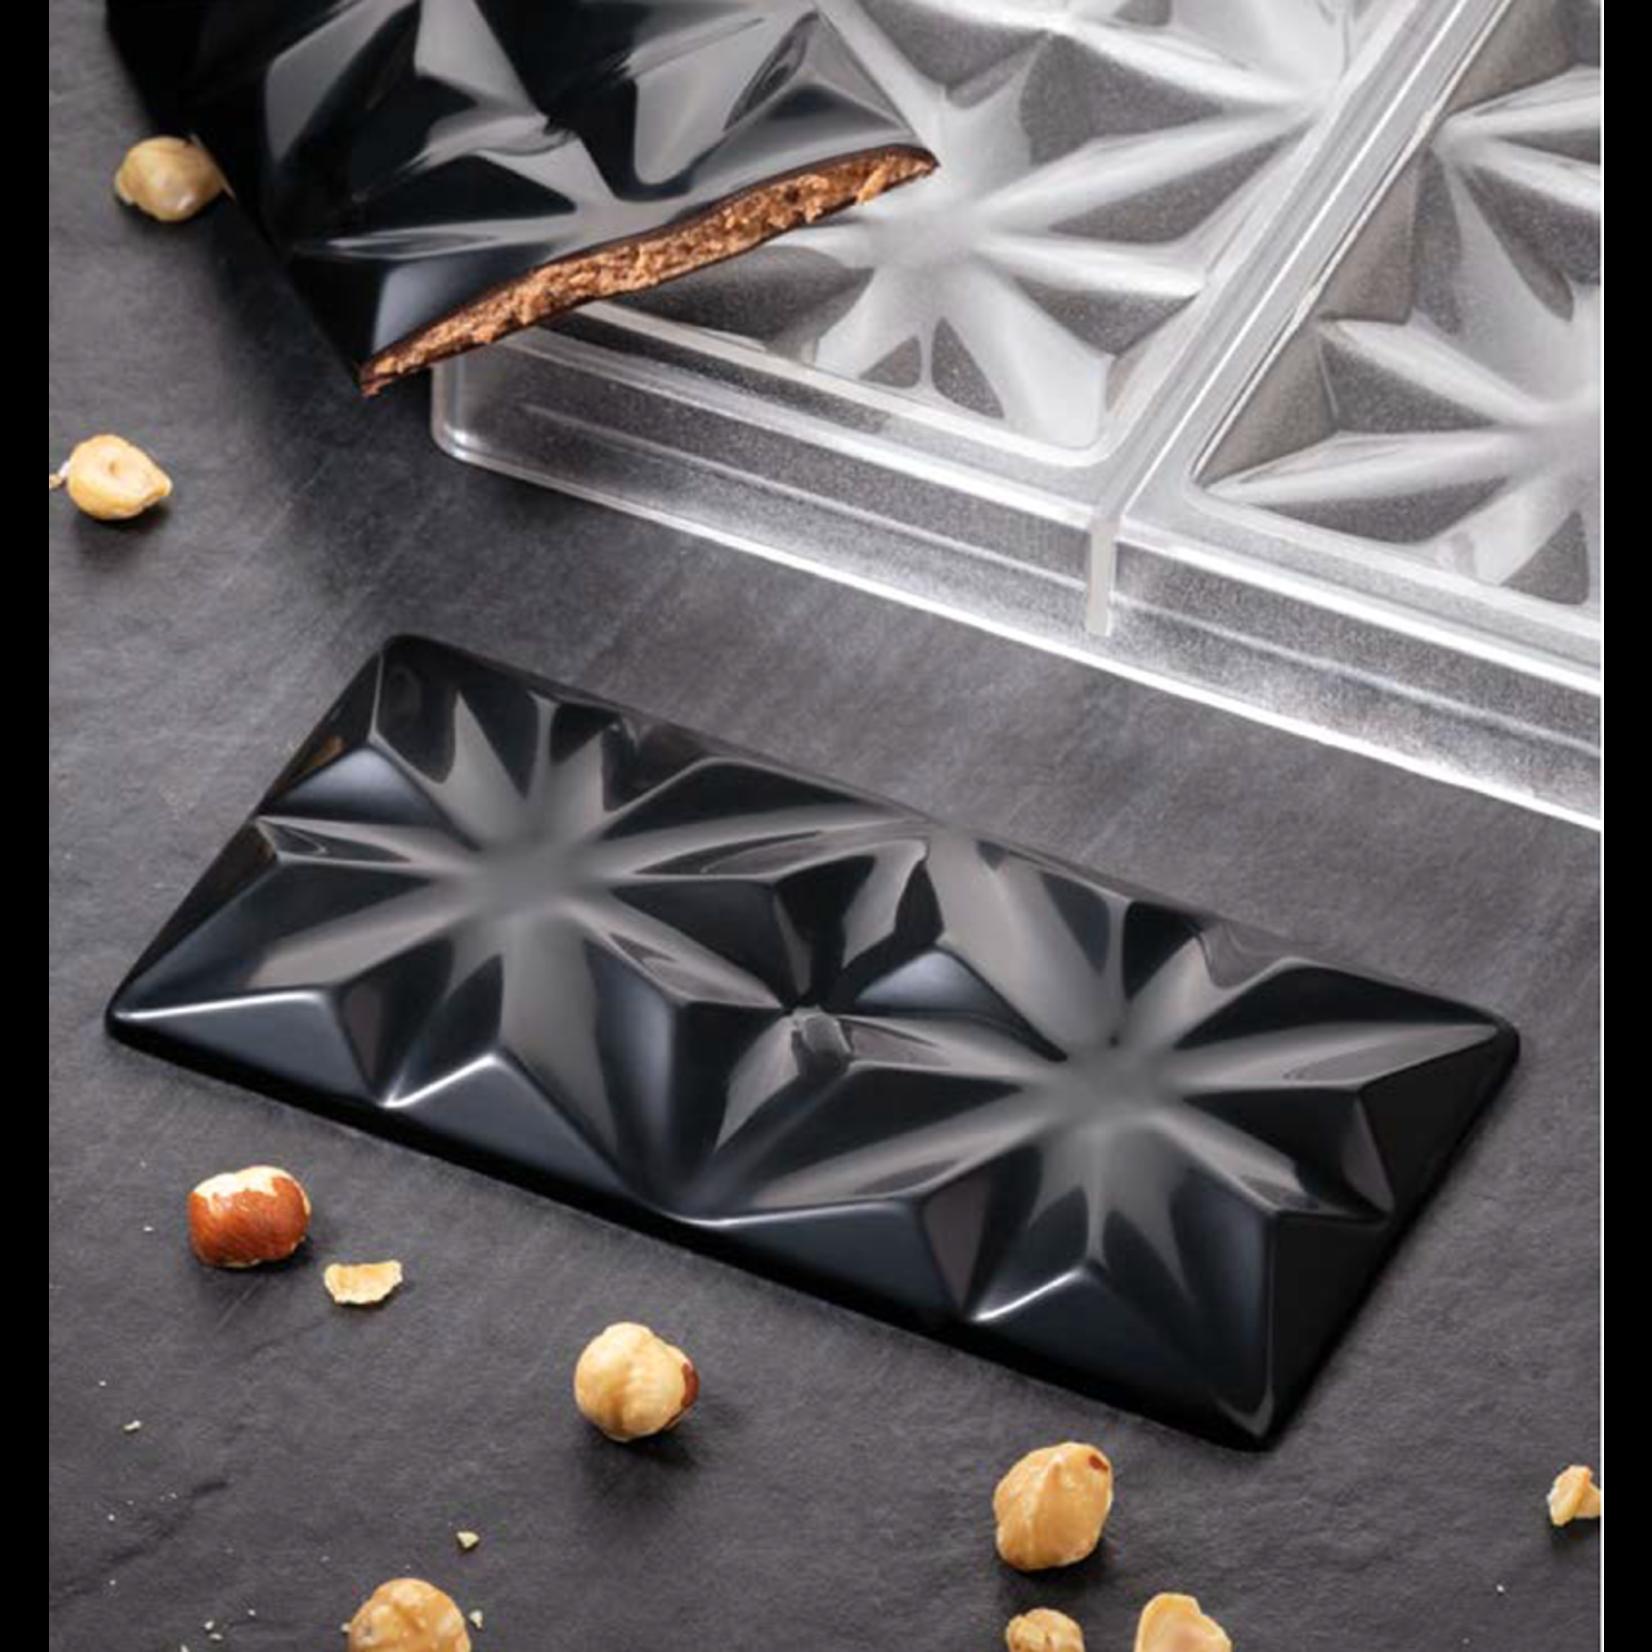 Pavoni Pavoni - Polycarbonate Chocolate Mold, Bar - Edelweiss, PC5005 (3 cavity)